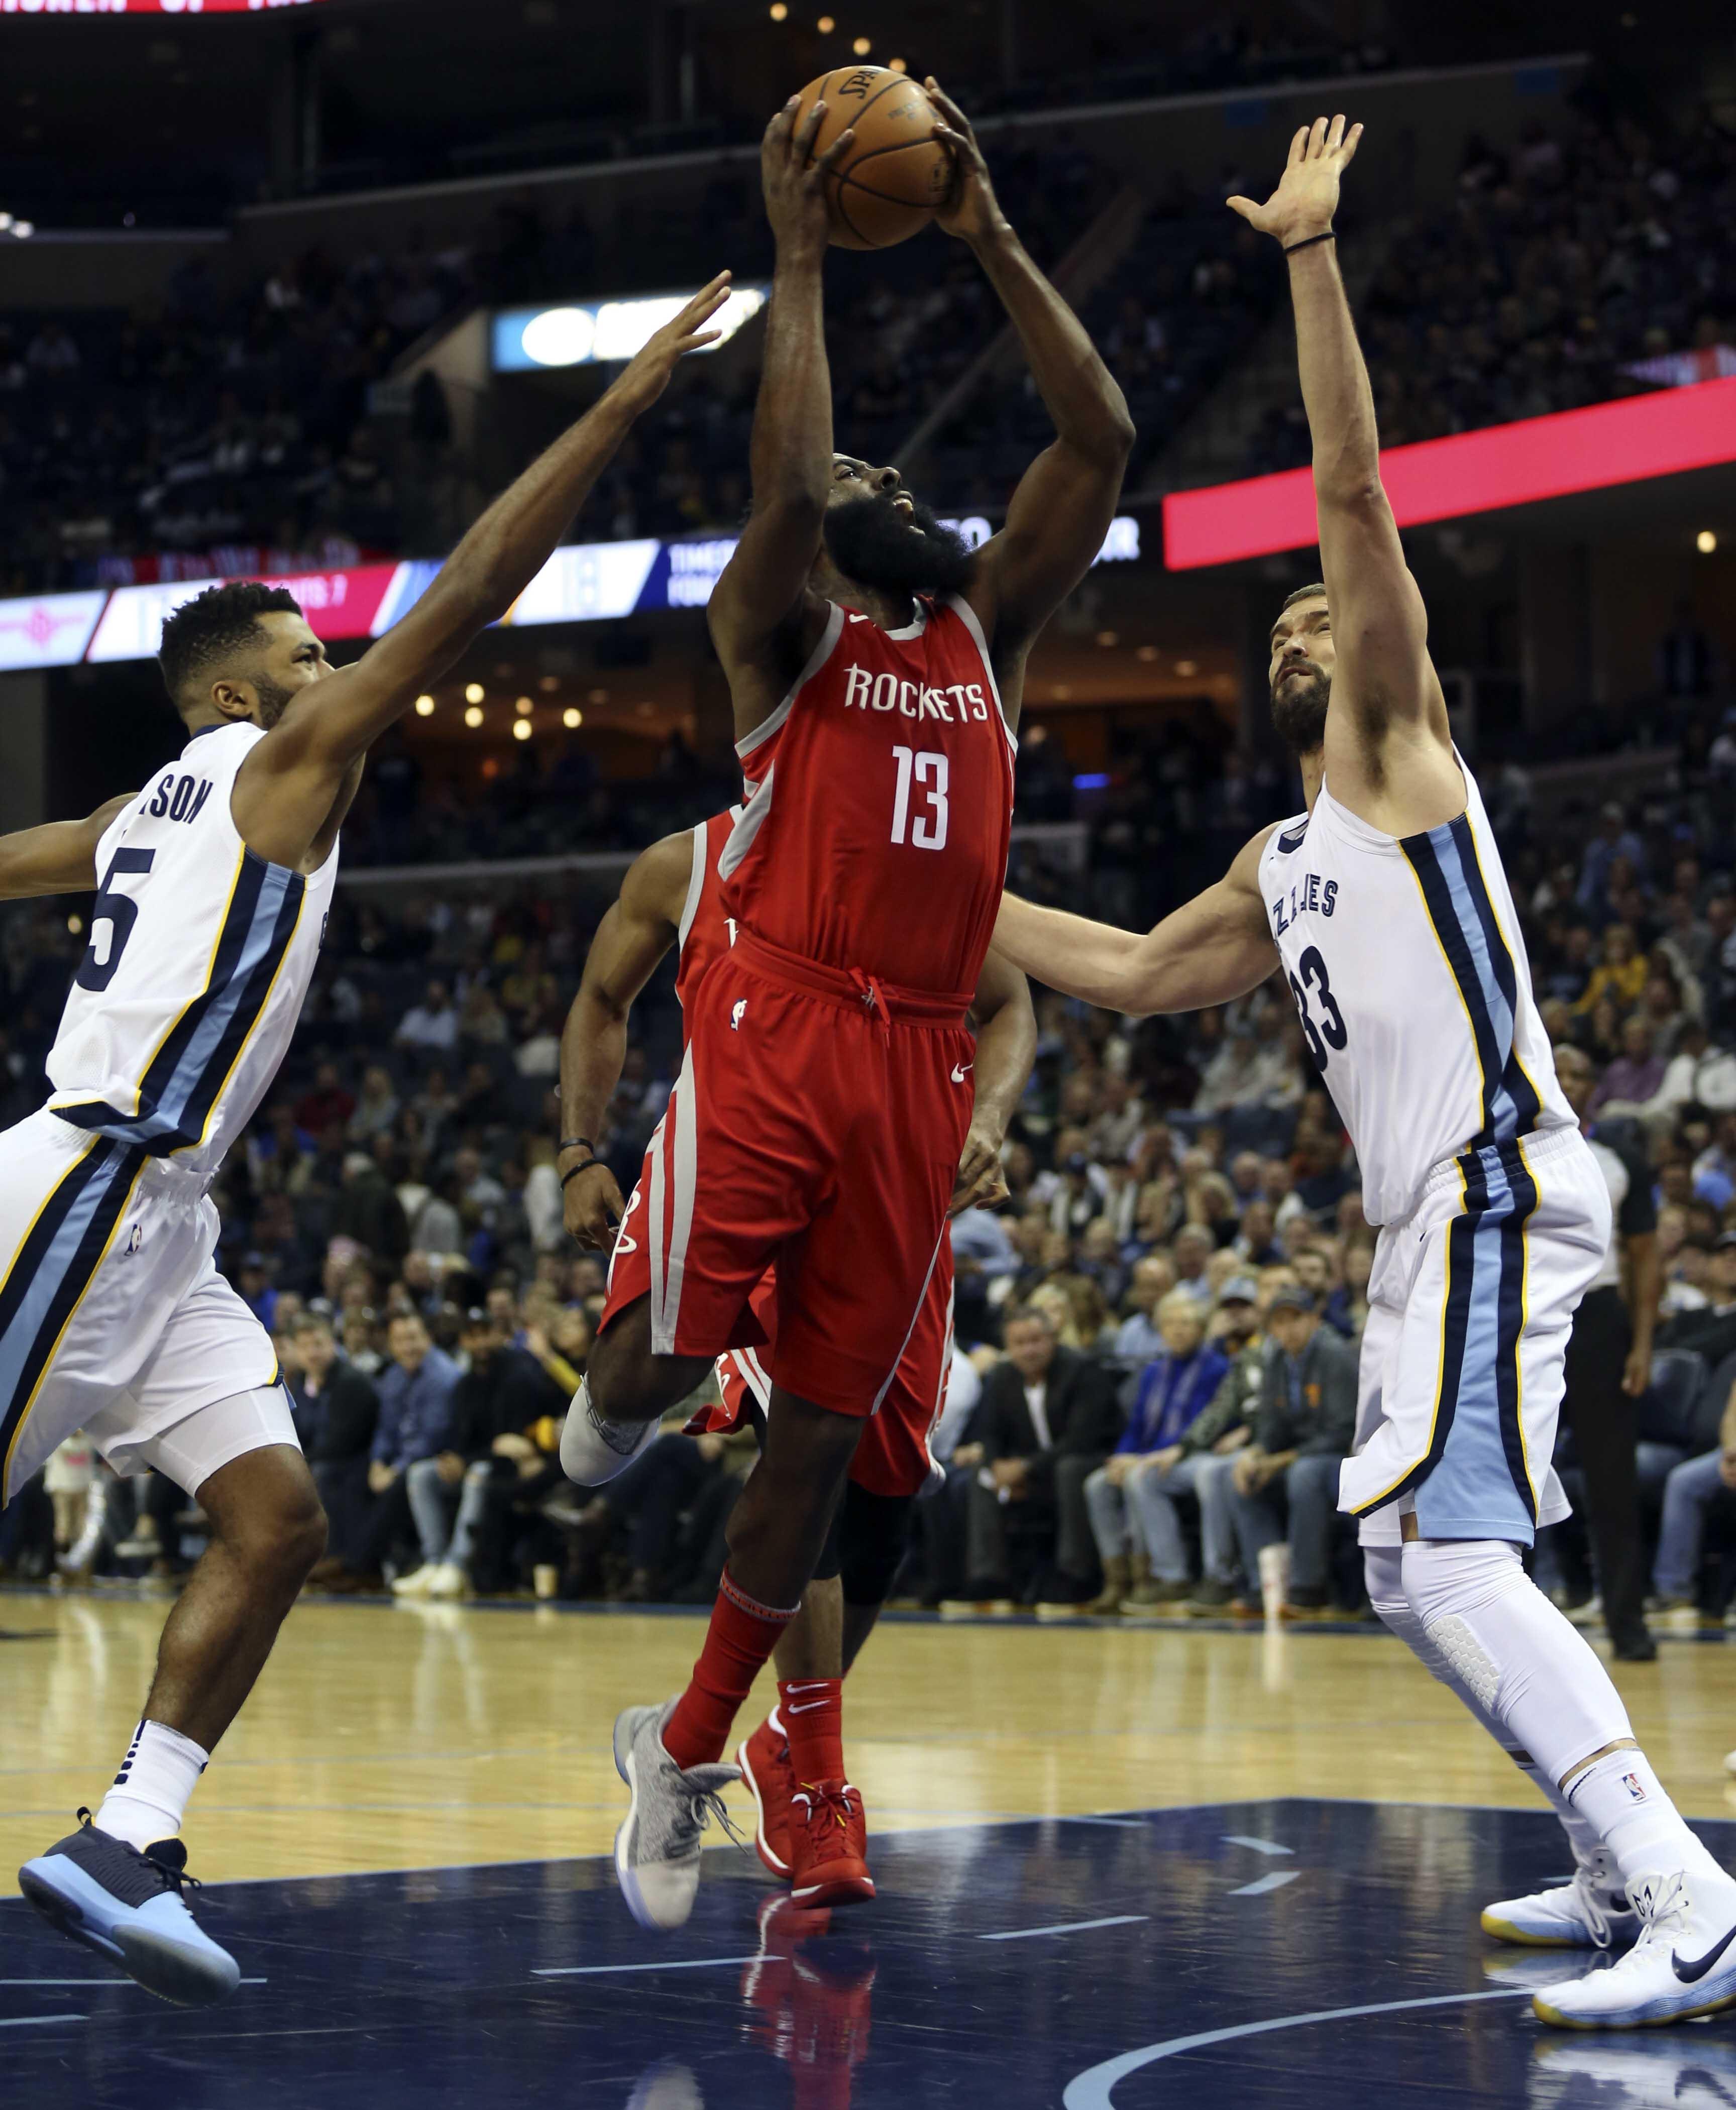 Houston Rockets Vs Denver Nuggets: The Dream Shake, A Houston Rockets Community